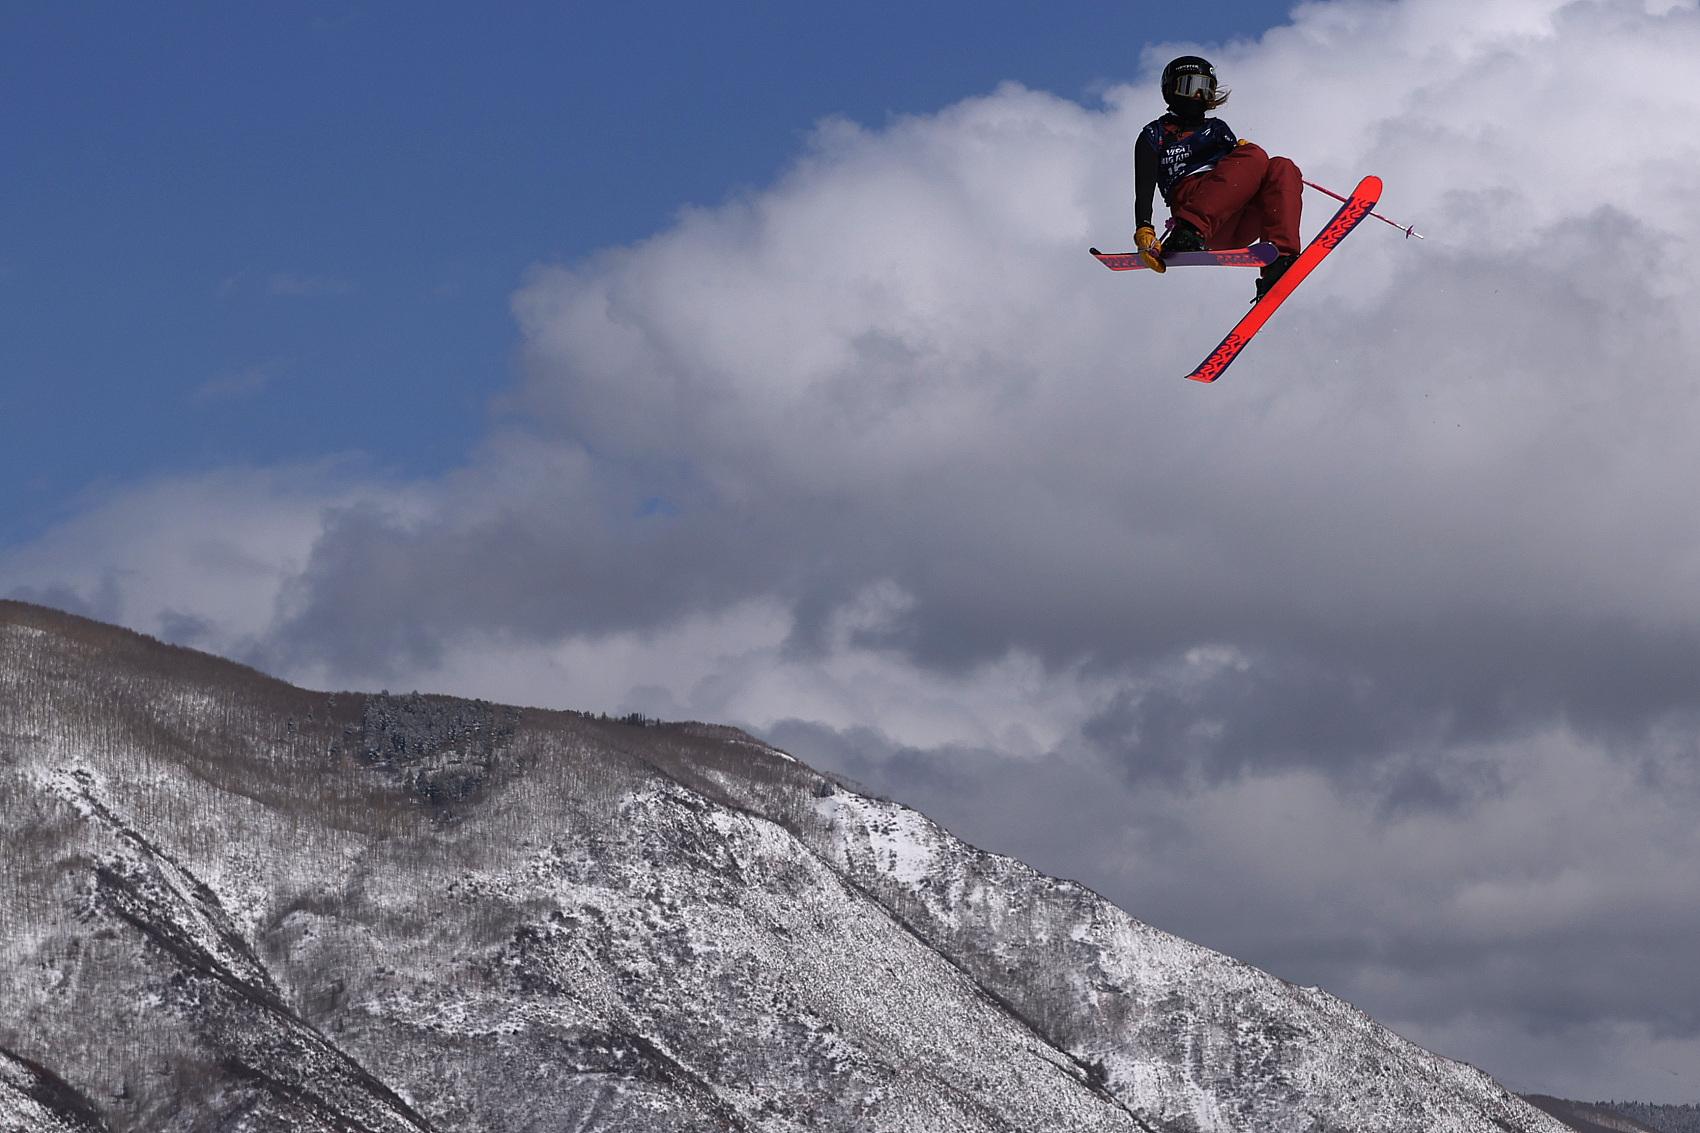 China's Gu reaches Big Air final at Freeski World Championships